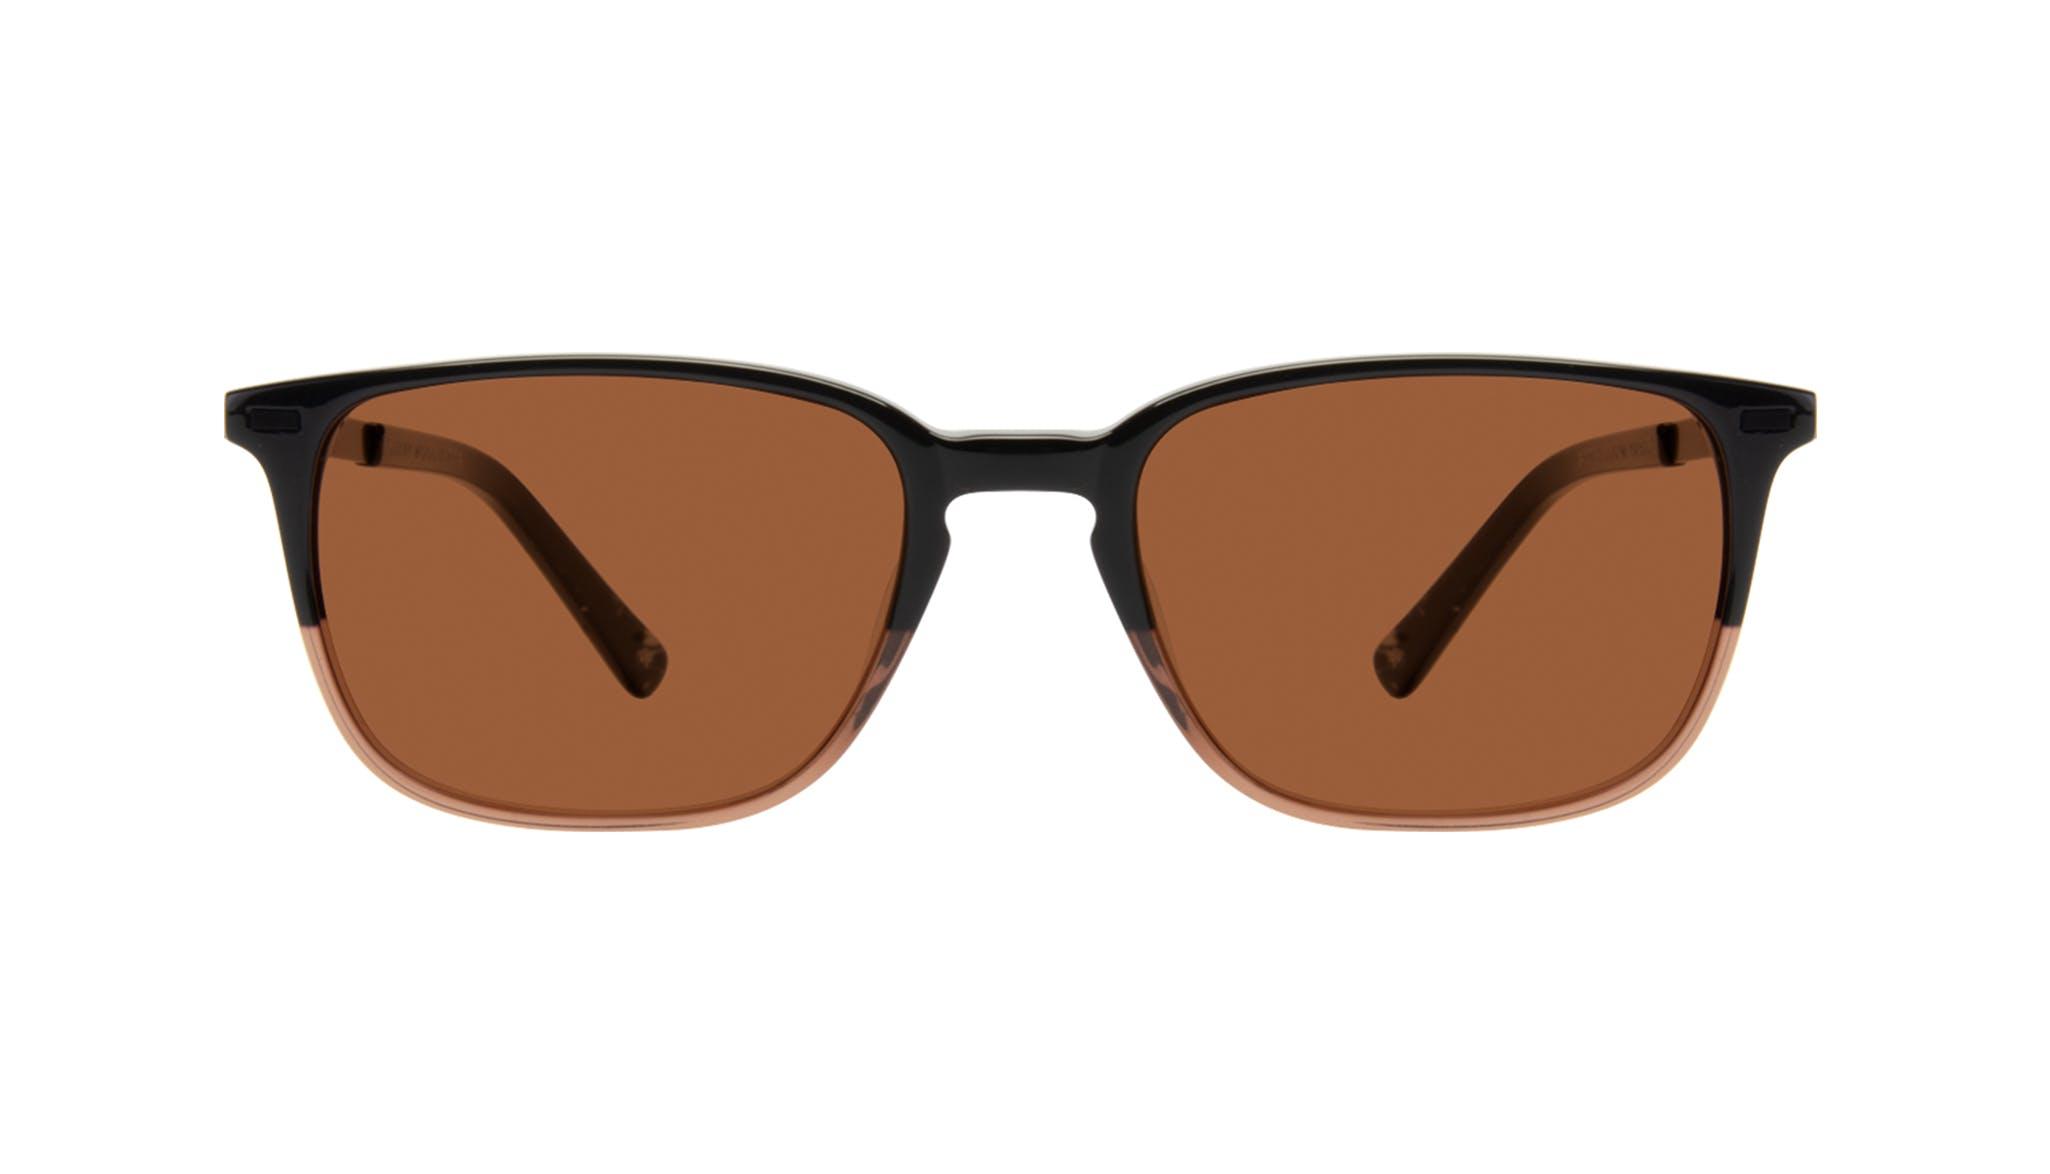 Affordable Fashion Glasses Rectangle Sunglasses Men Sharp Wood Terra